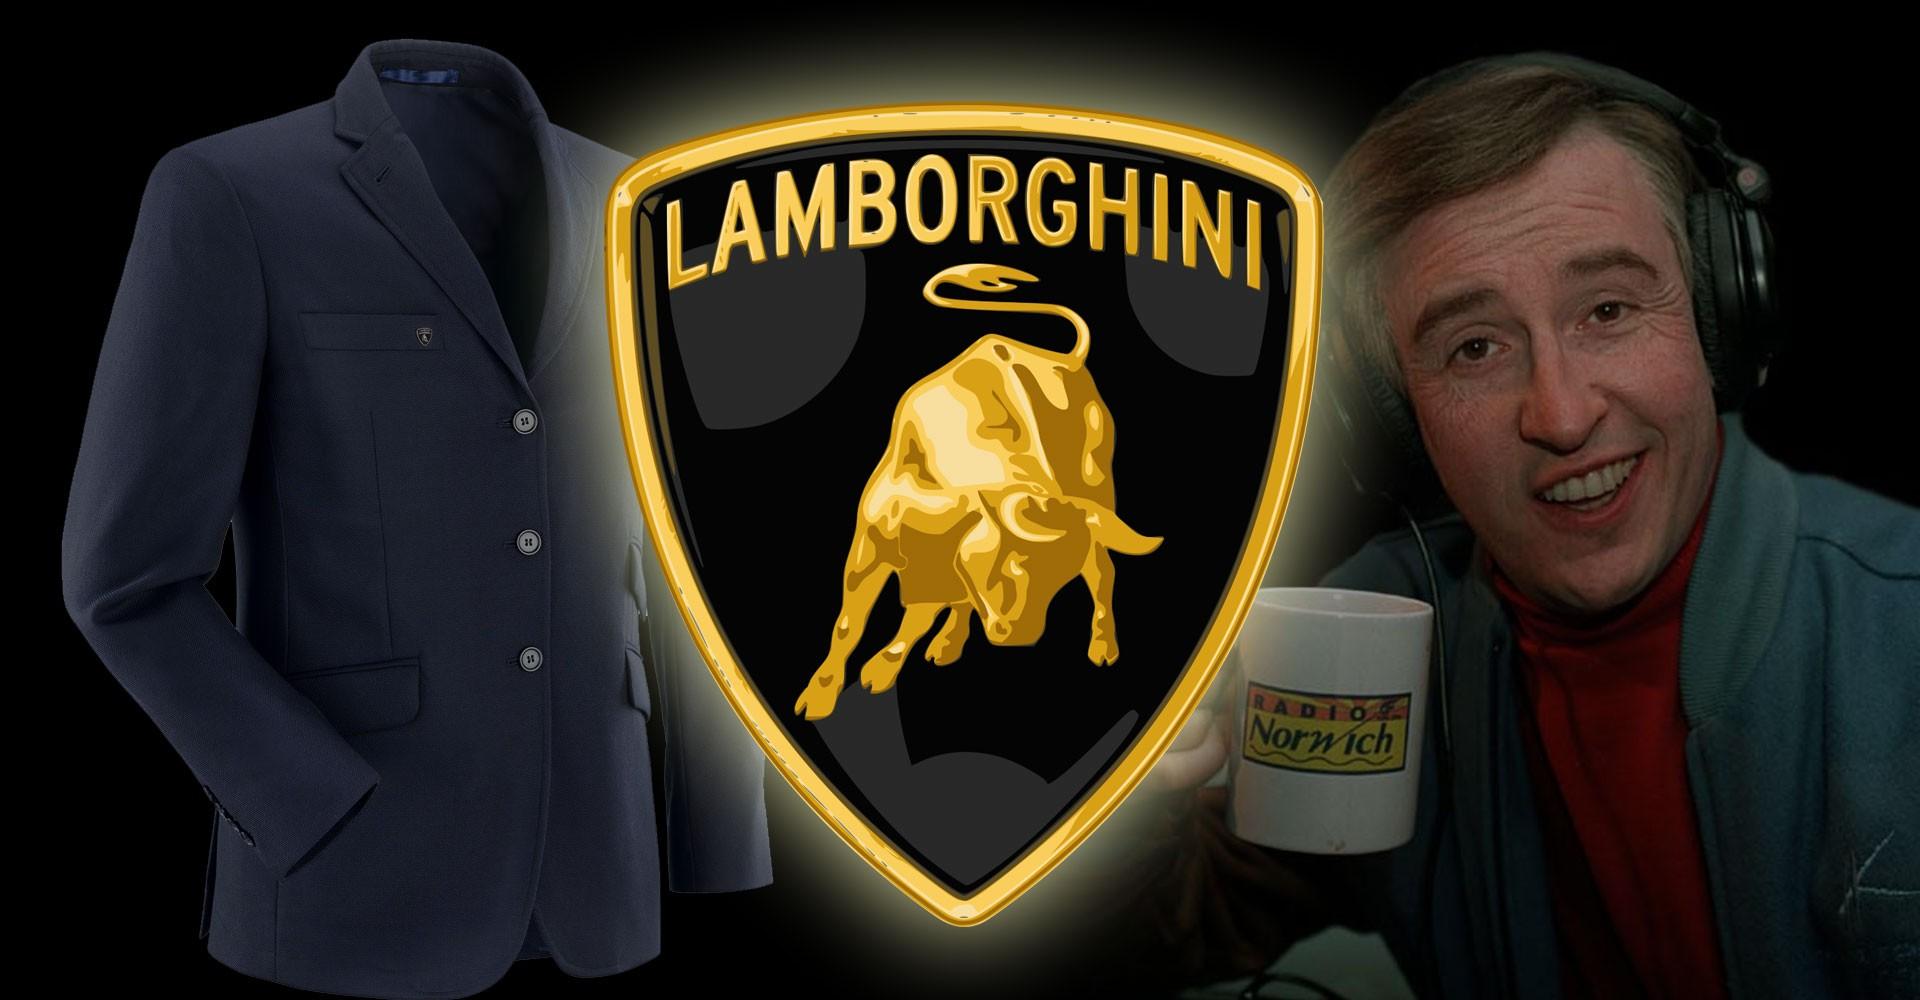 Lamborghini Releases New Clothing Range, Commits Accidental Partridge